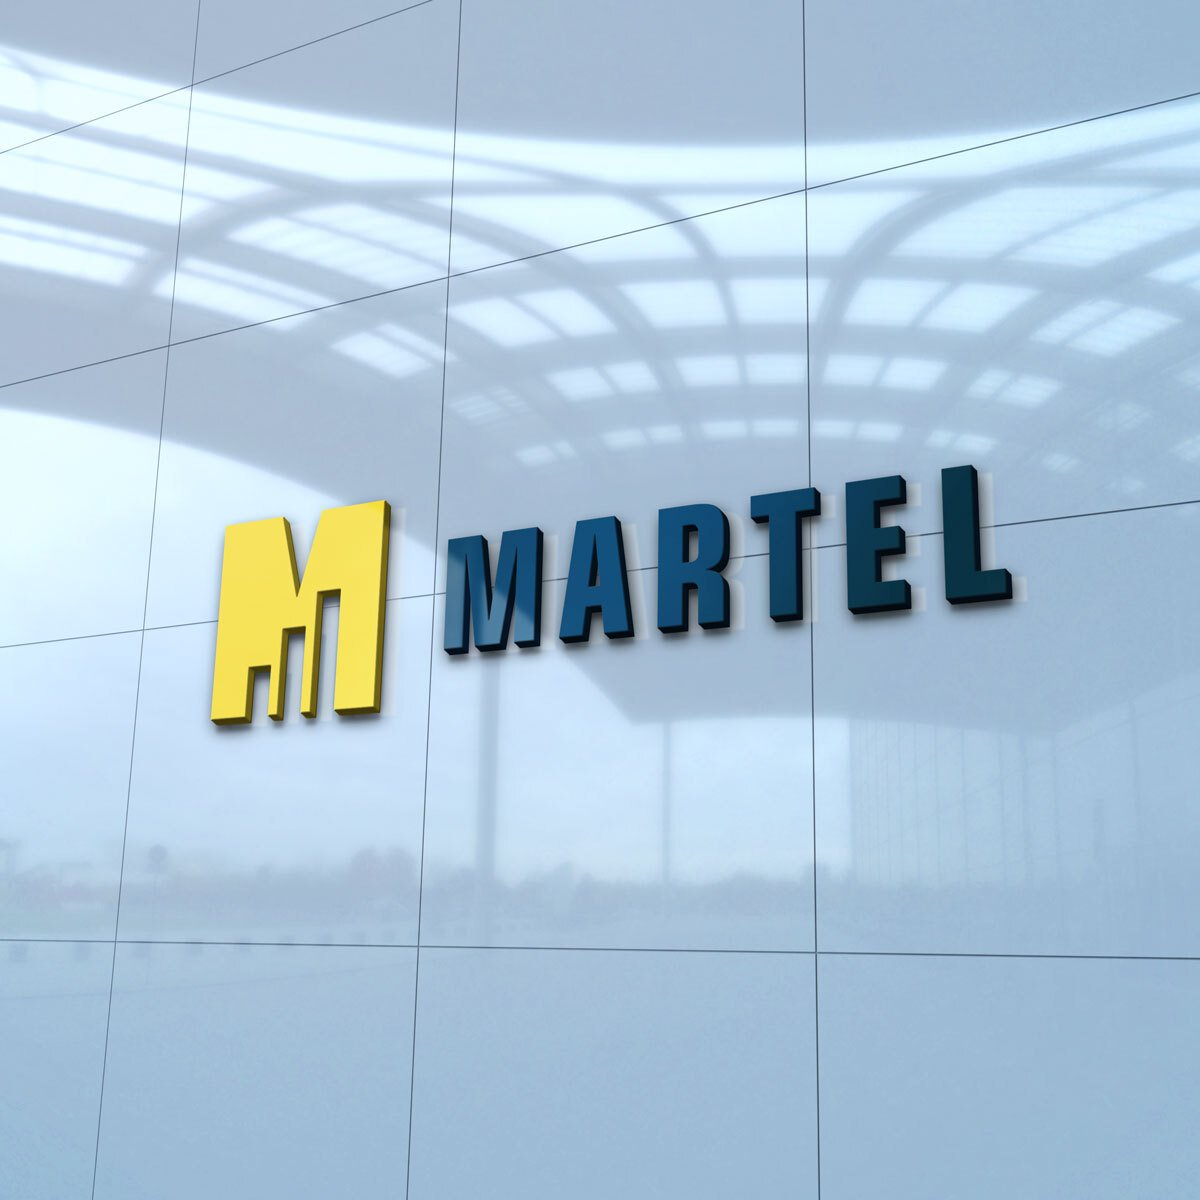 Martel Logo Design by BrandSwan, a logo design company